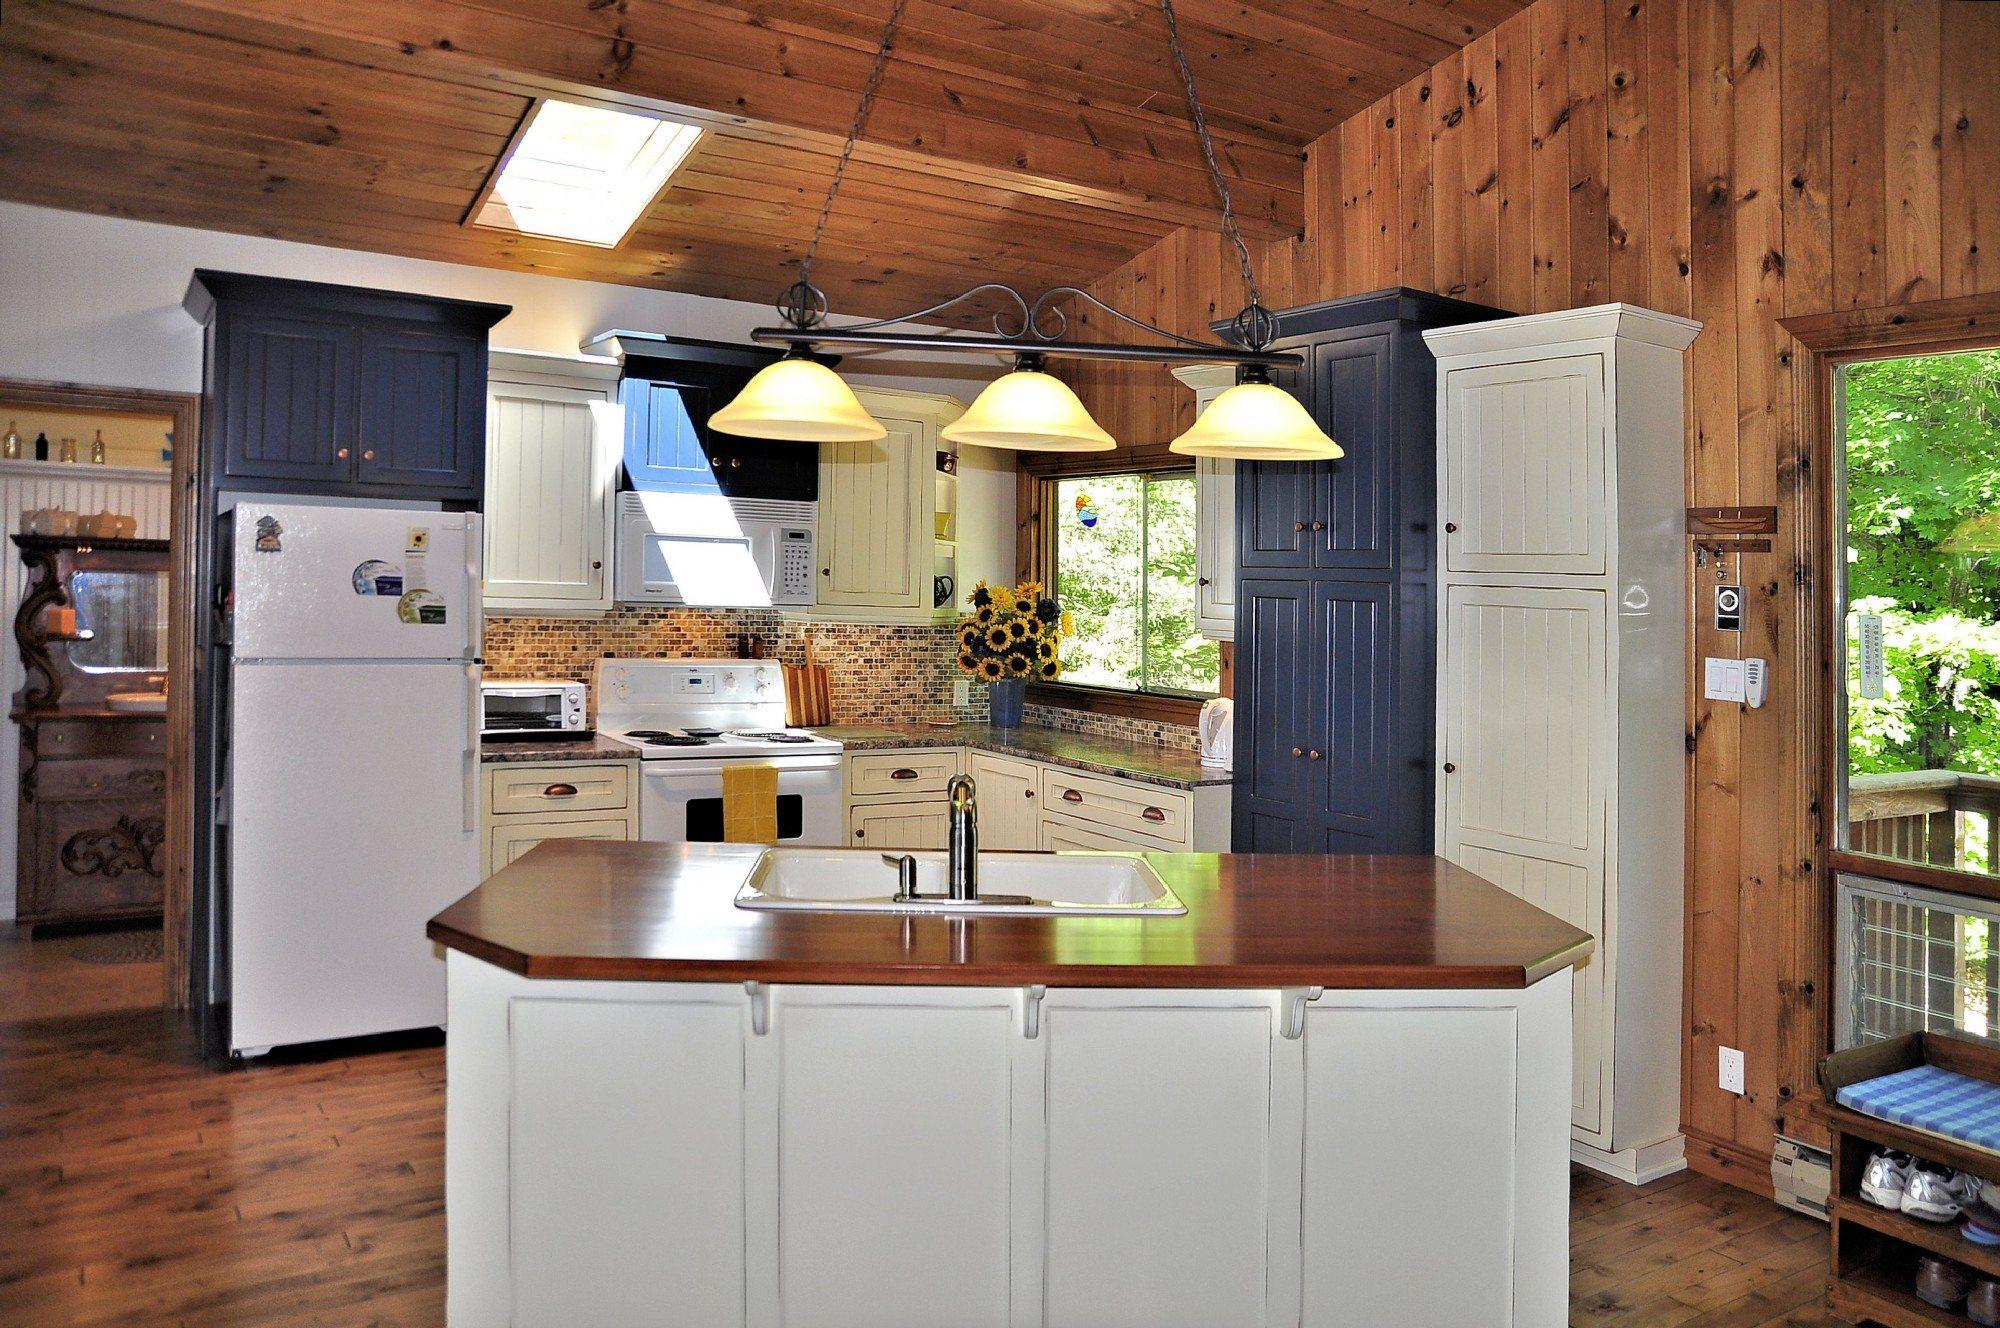 kawartha-lakes-cottage-for-sale-315-crego-lake-road-2